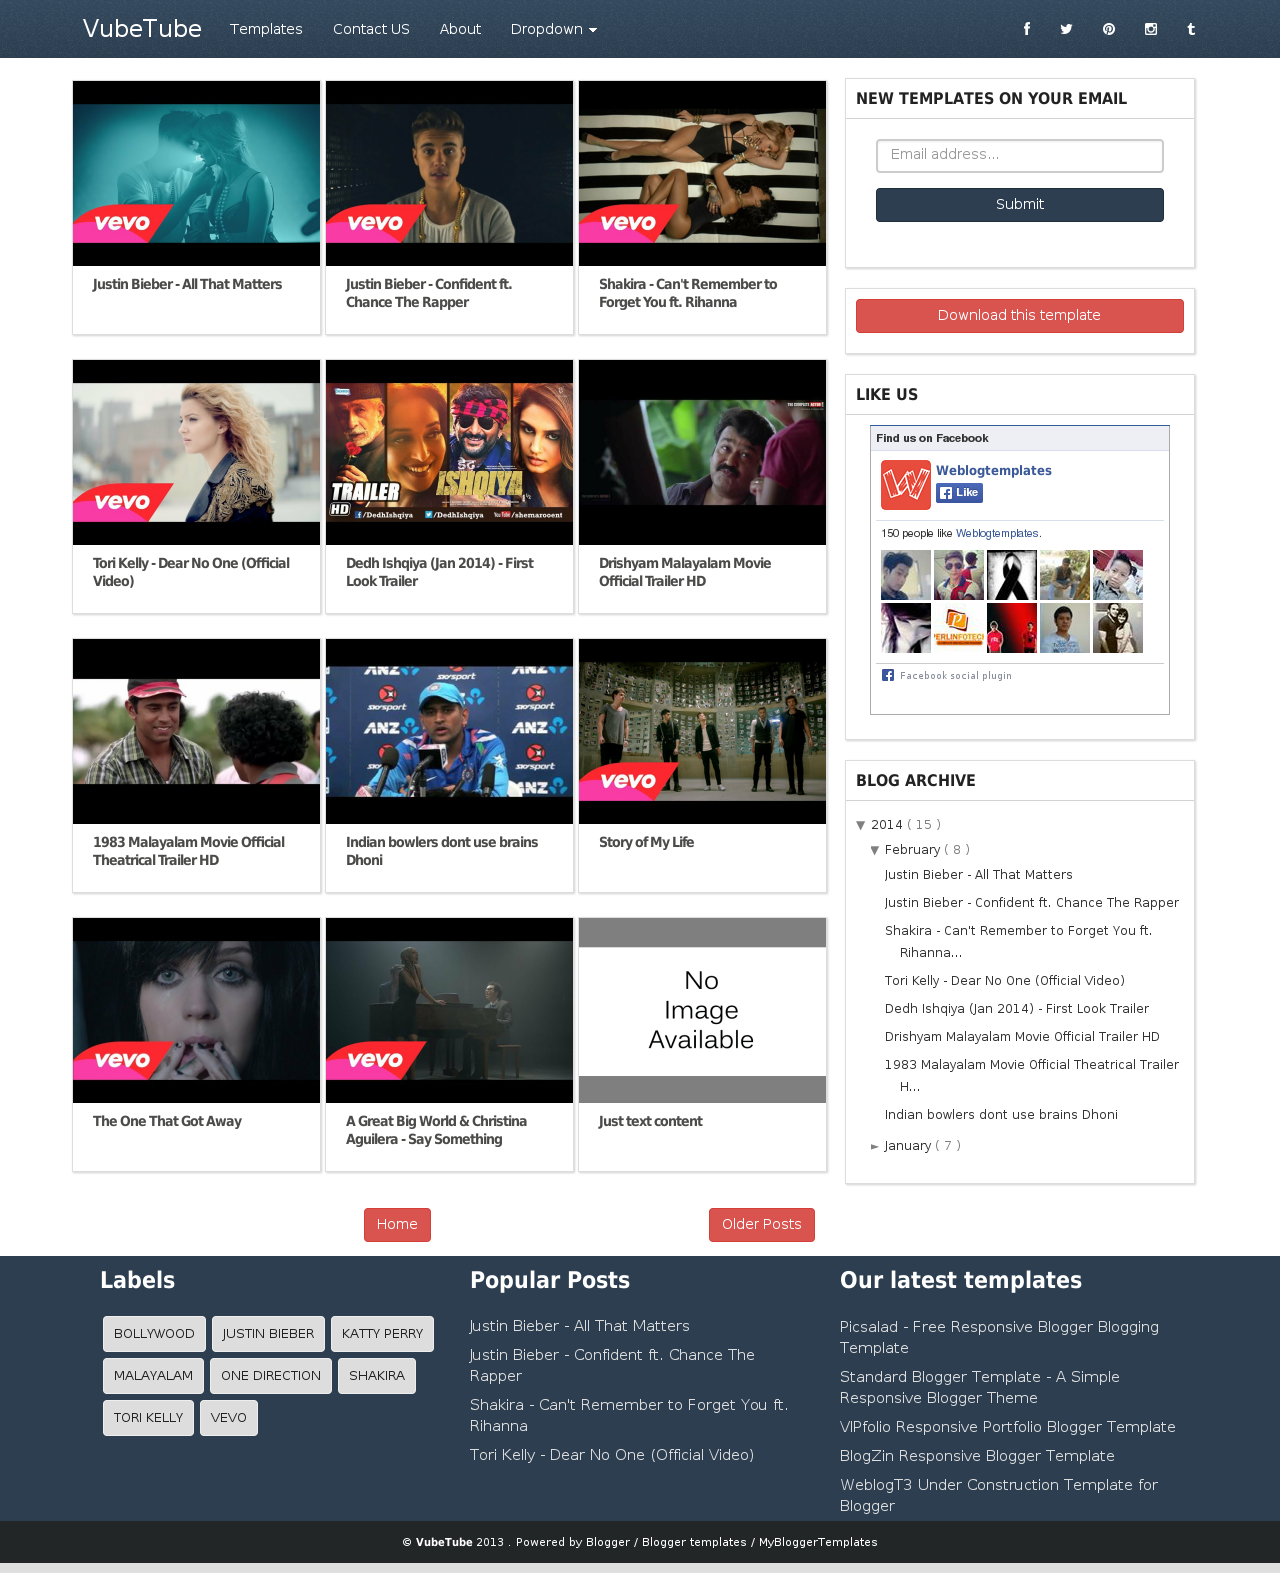 VubeTube - Responsive Video Blogger Template | Free Video Blogger ...